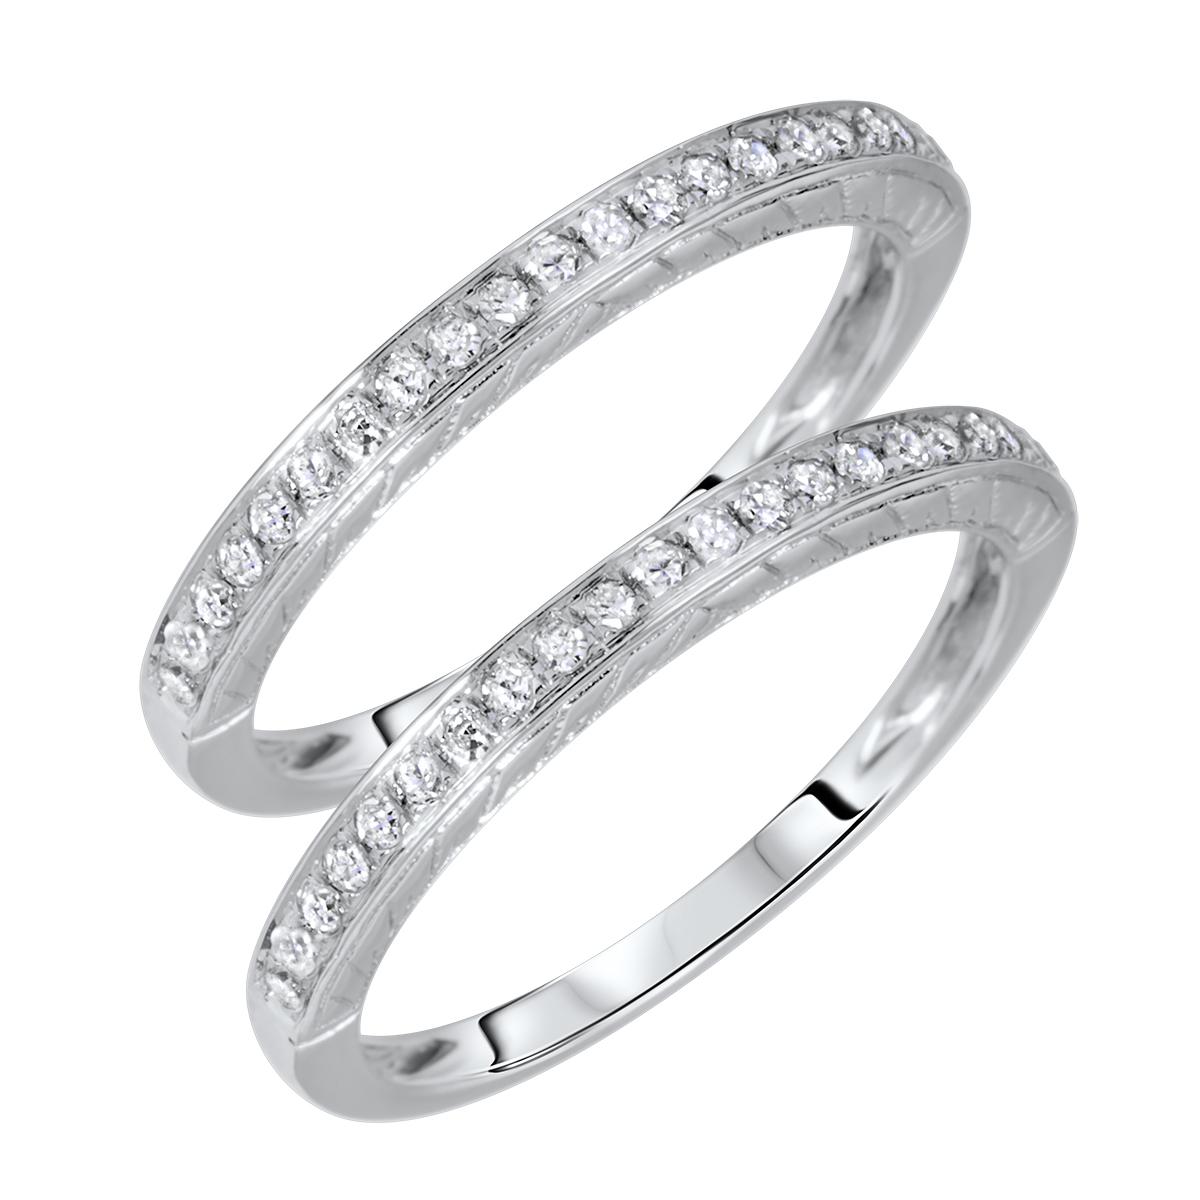 1/4 Carat T.W. Rounds Cut Ladies Same Sex Wedding Band Set 14K White Gold- Size